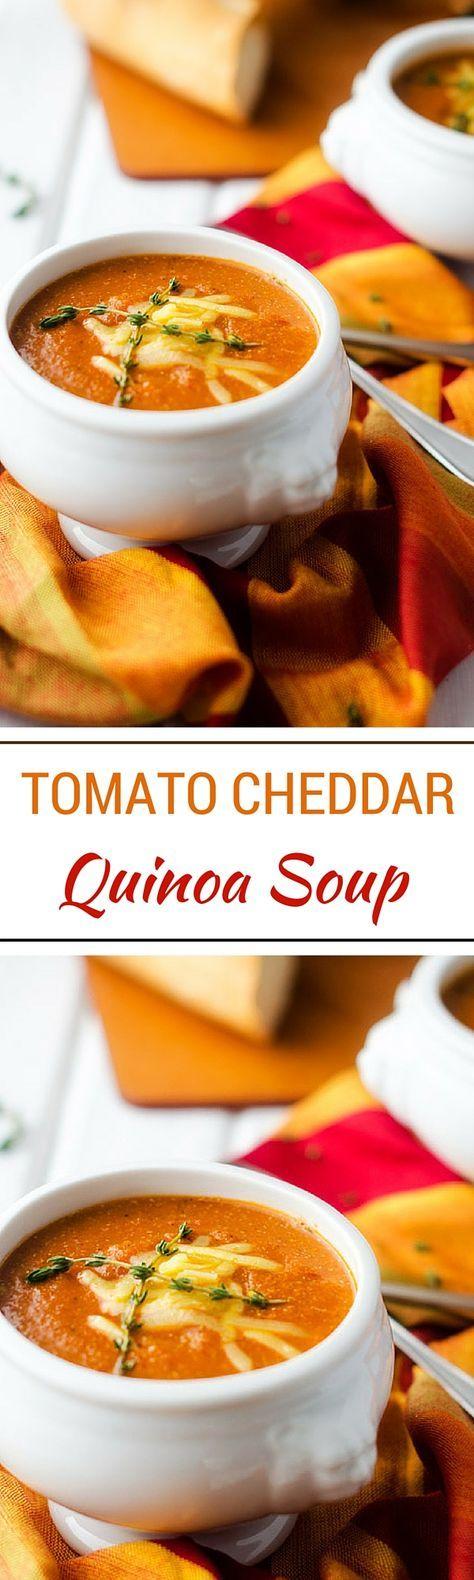 Tomato Cheddar Quinoa Soup (gluten free soup recipe, vegetarian recipe, vegan option)